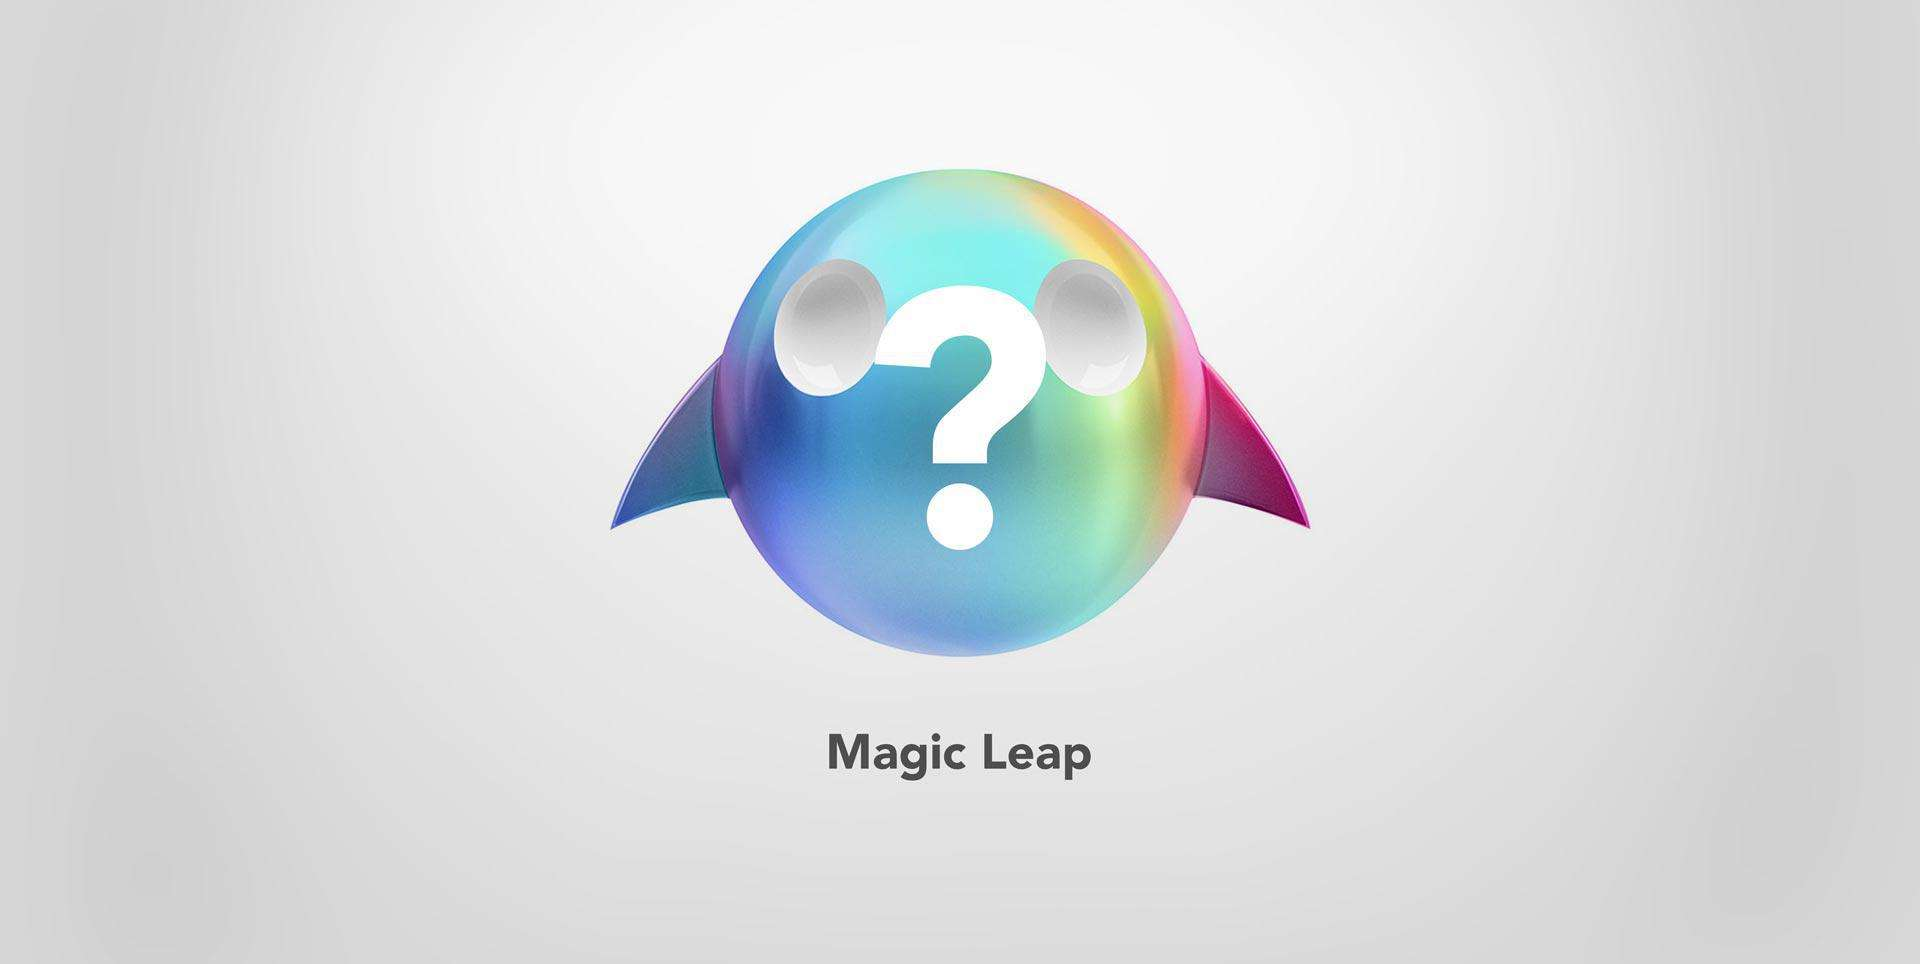 Magic leap mixed reality